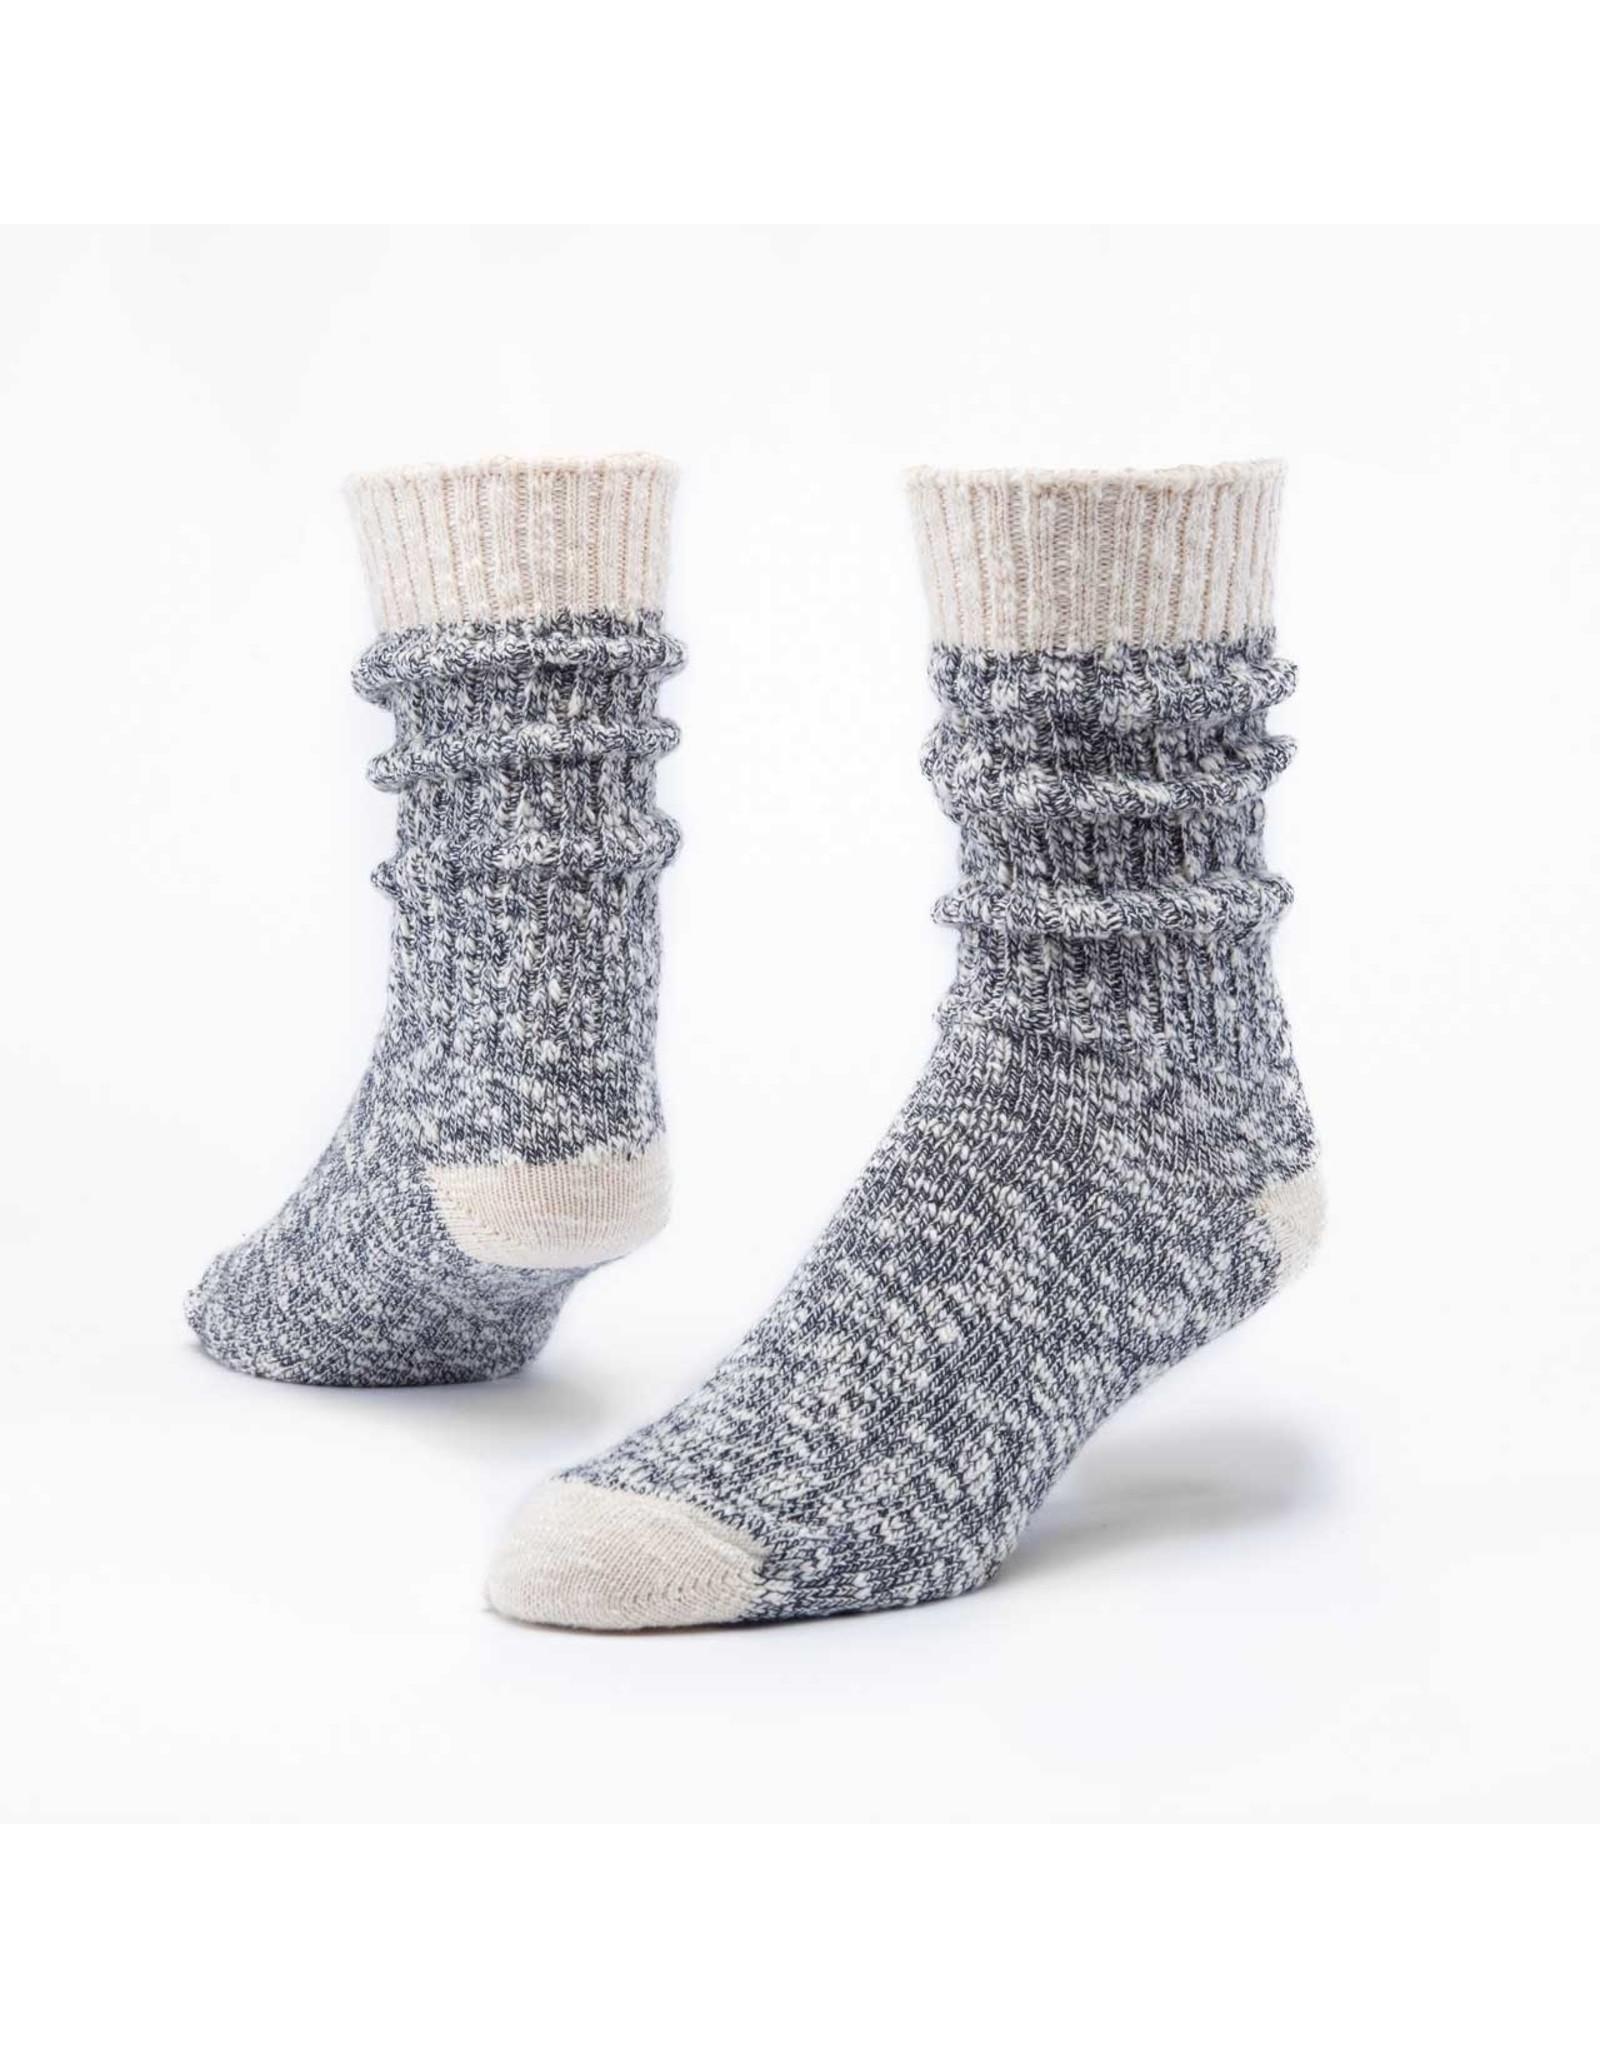 Organic Cotton Ragg Socks, Navy